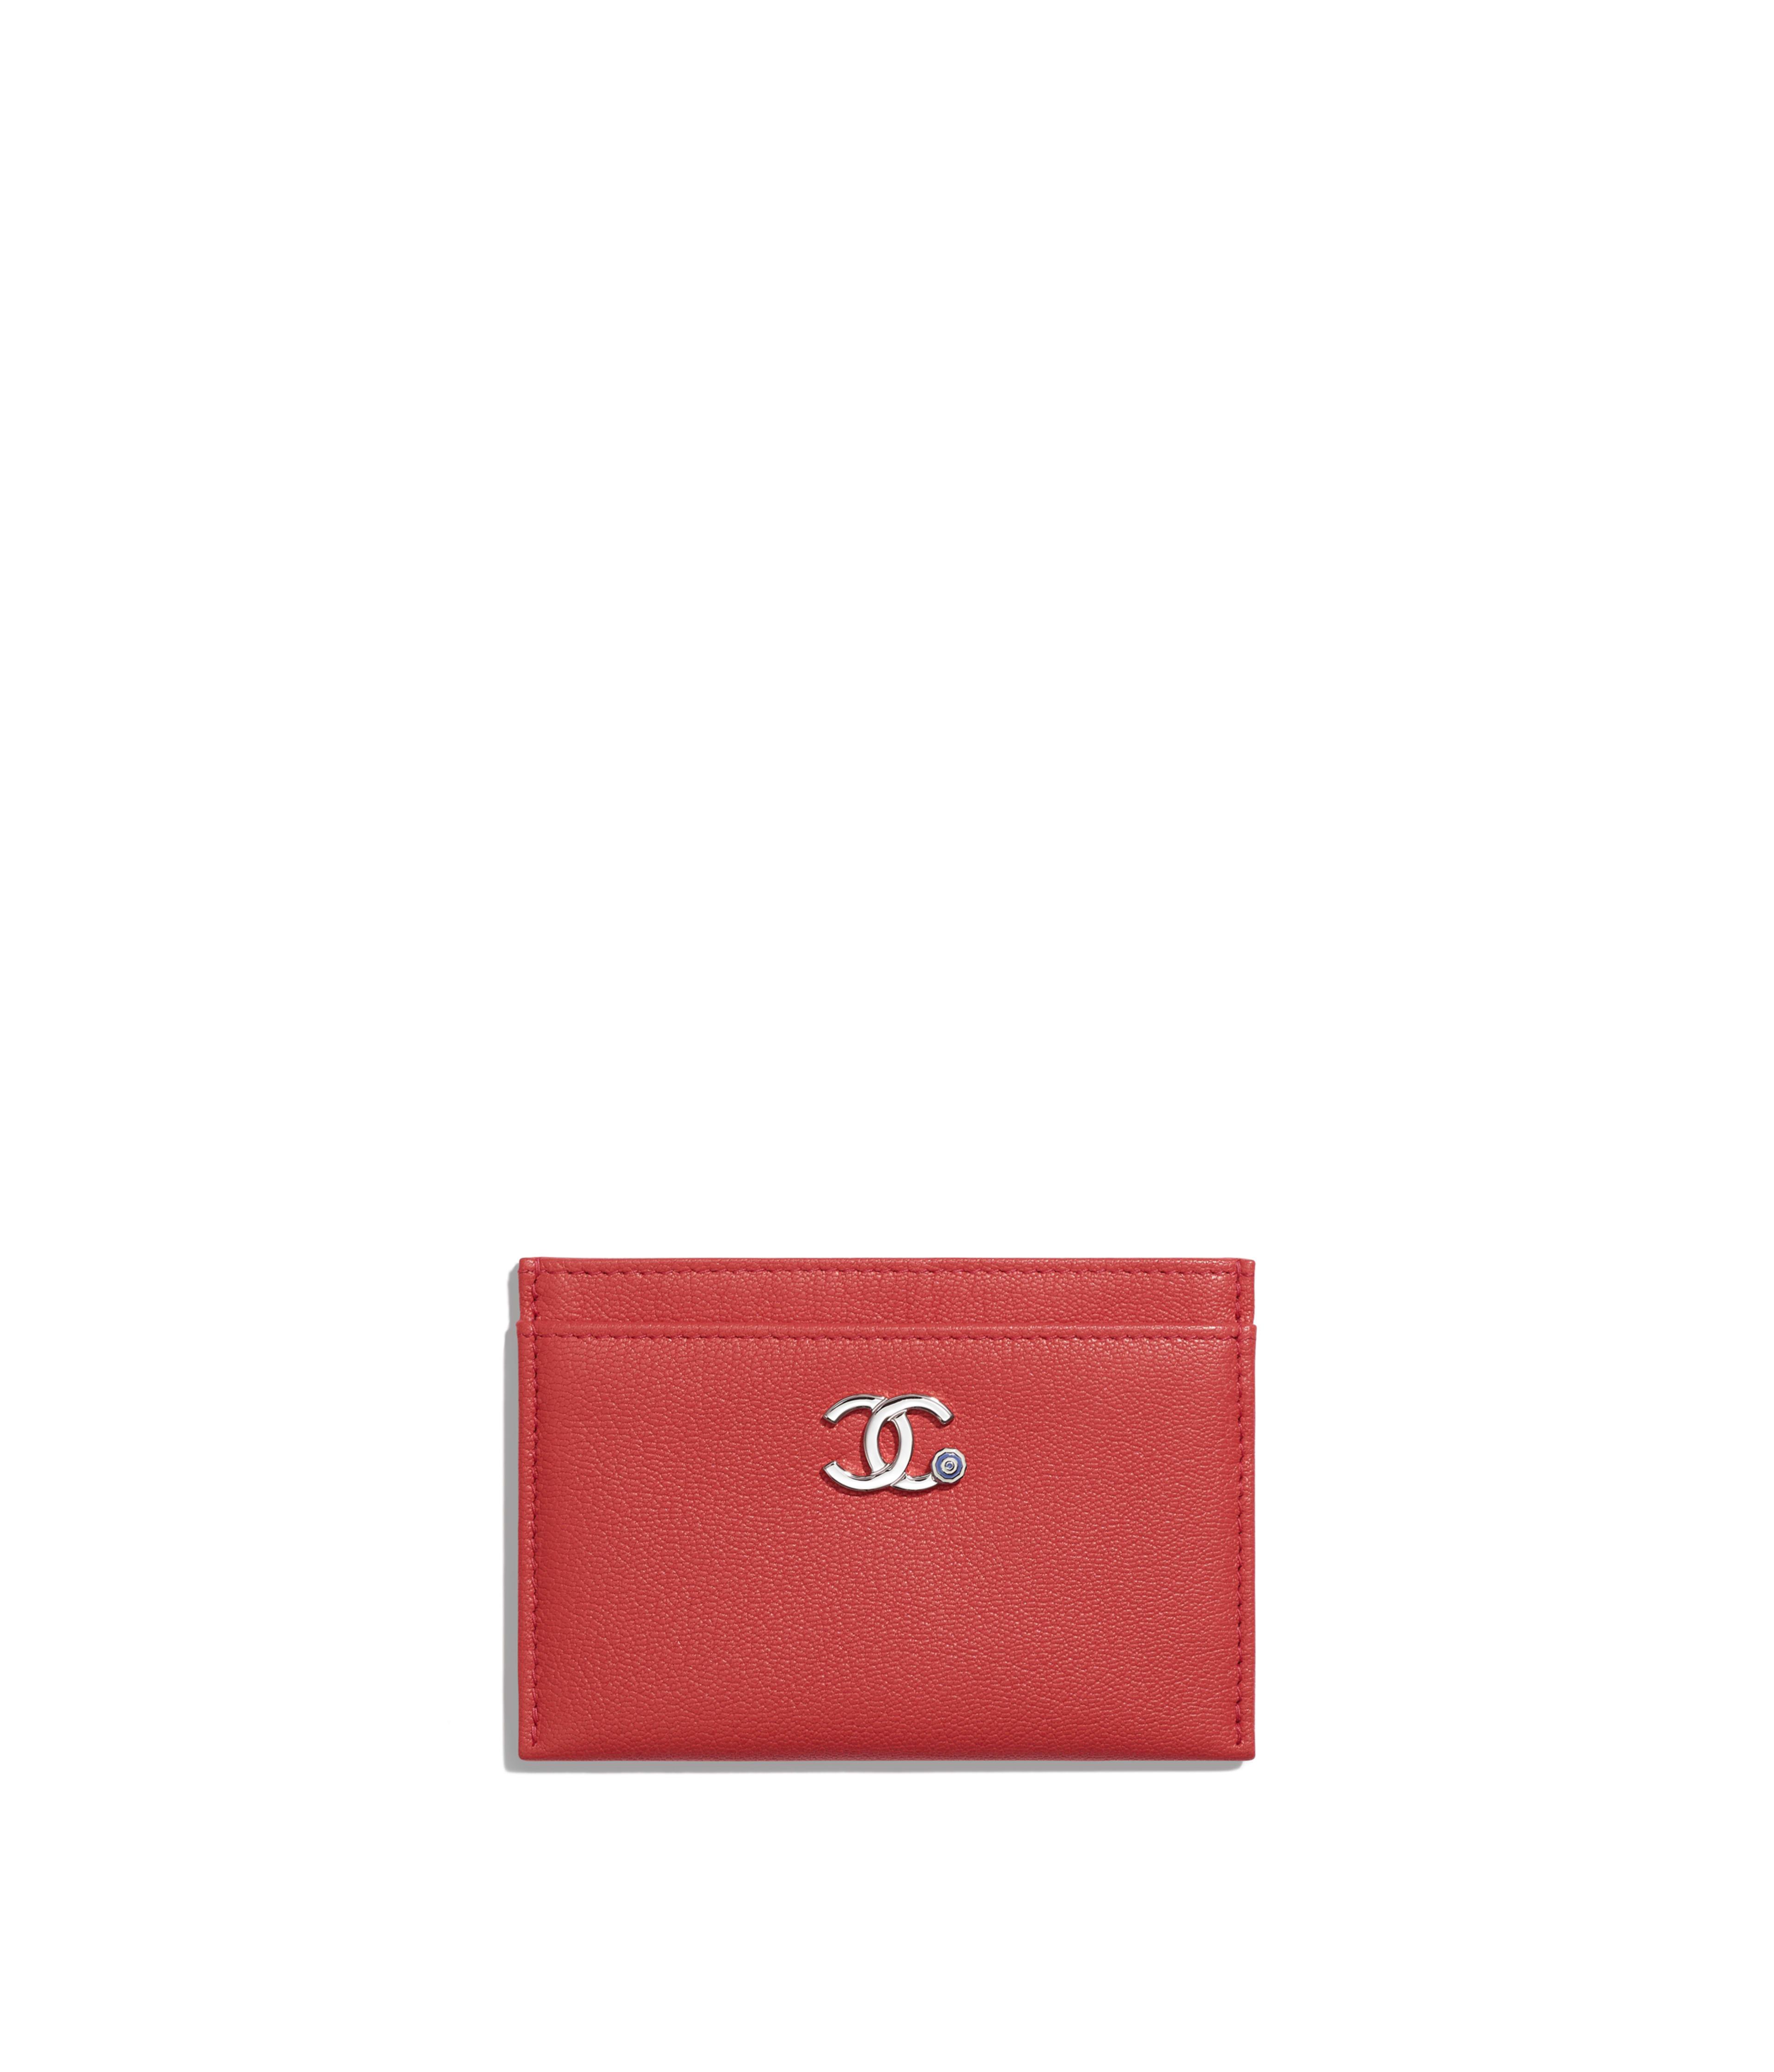 260346e4d64e Card Holder Goatskin & Silver-Tone Metal, Red Ref. AP0269B00322N4511